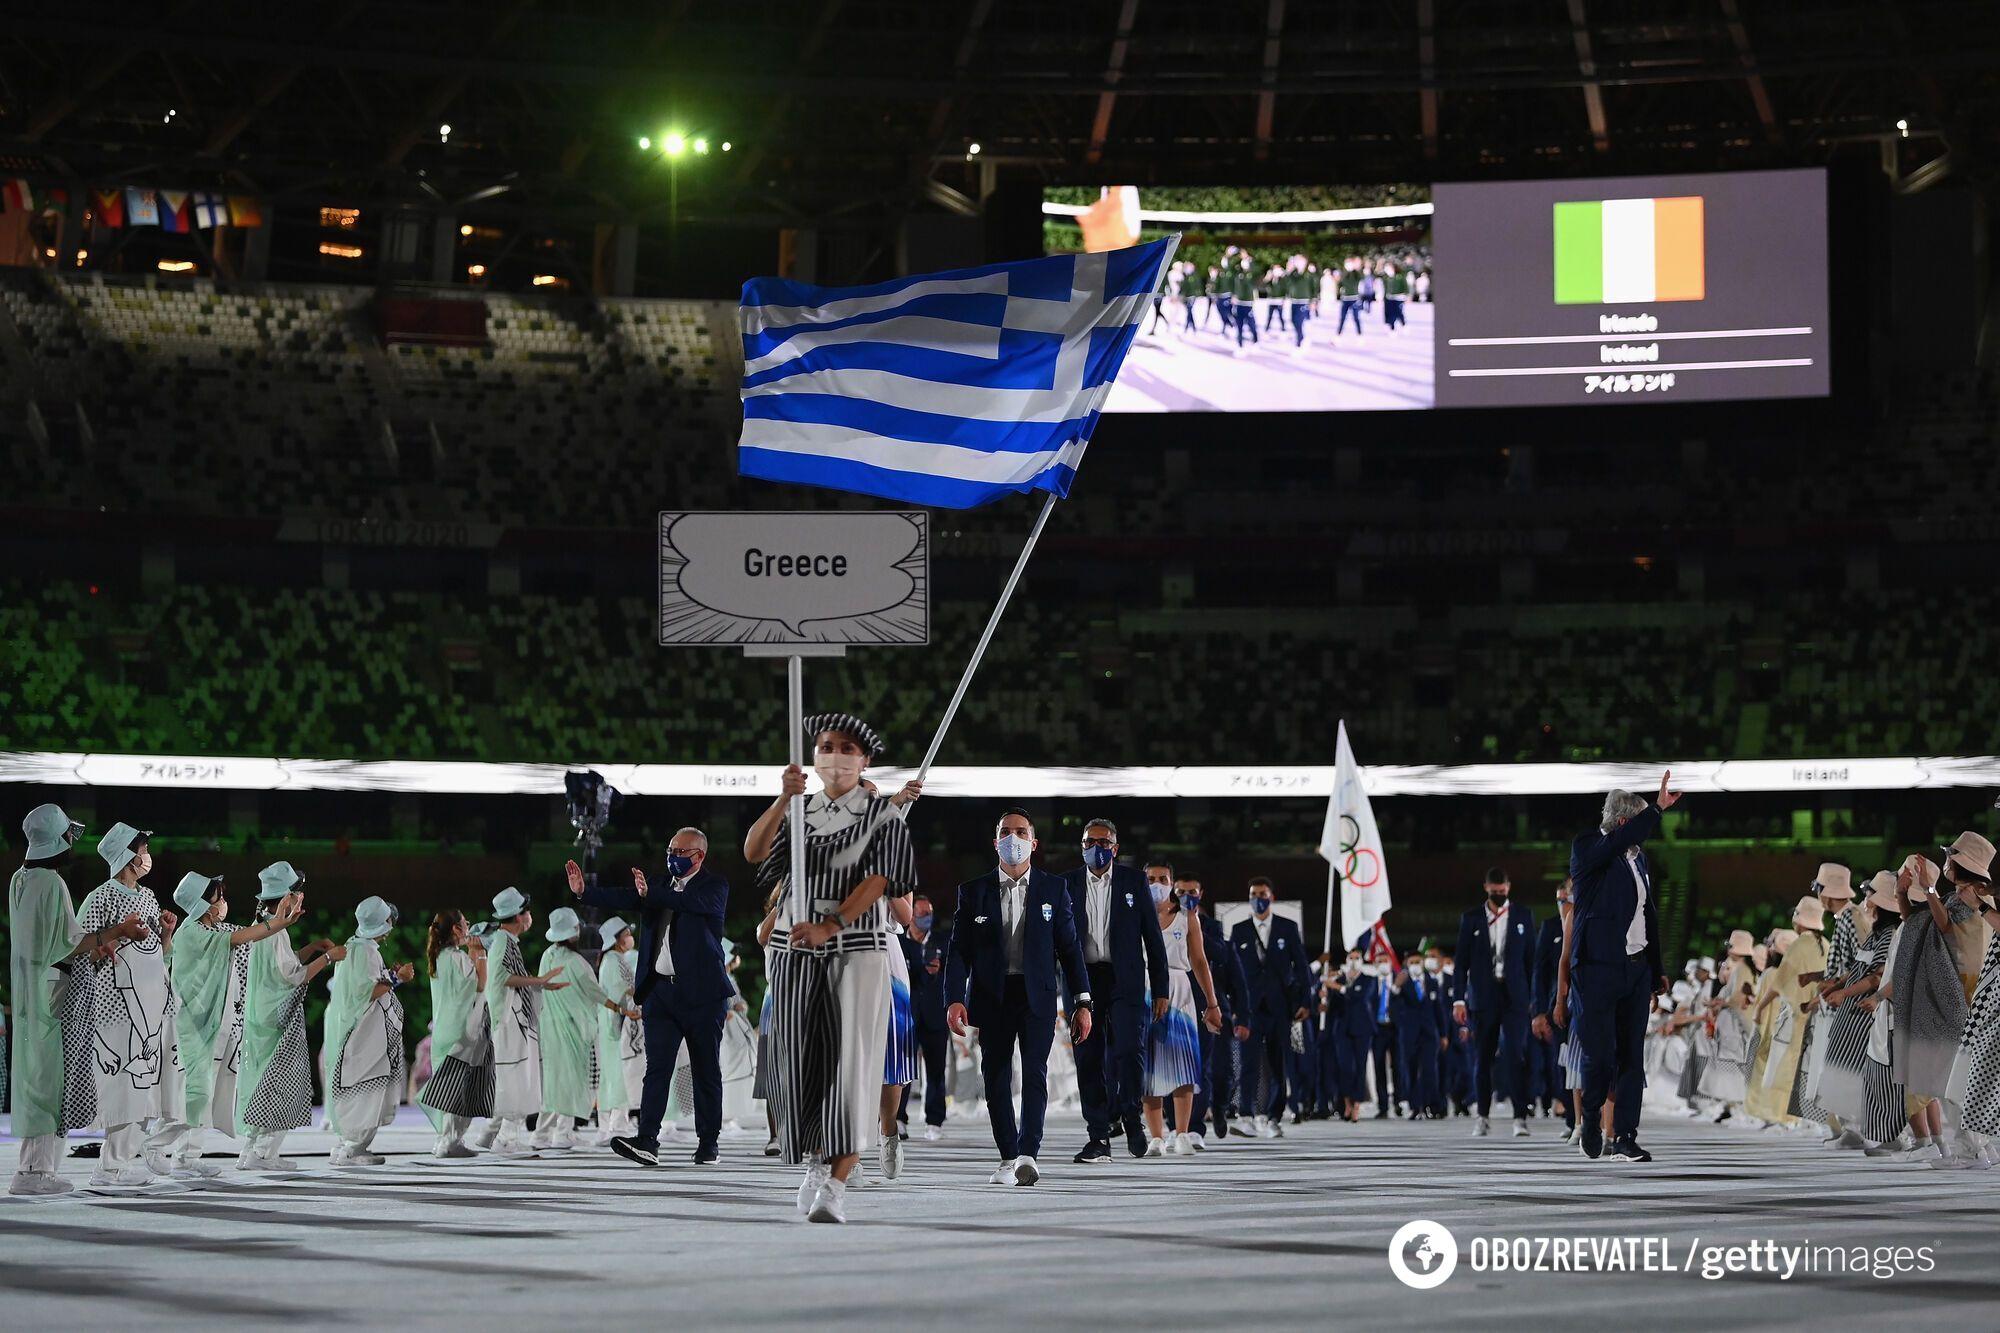 Греция на открытии Олимпиады.